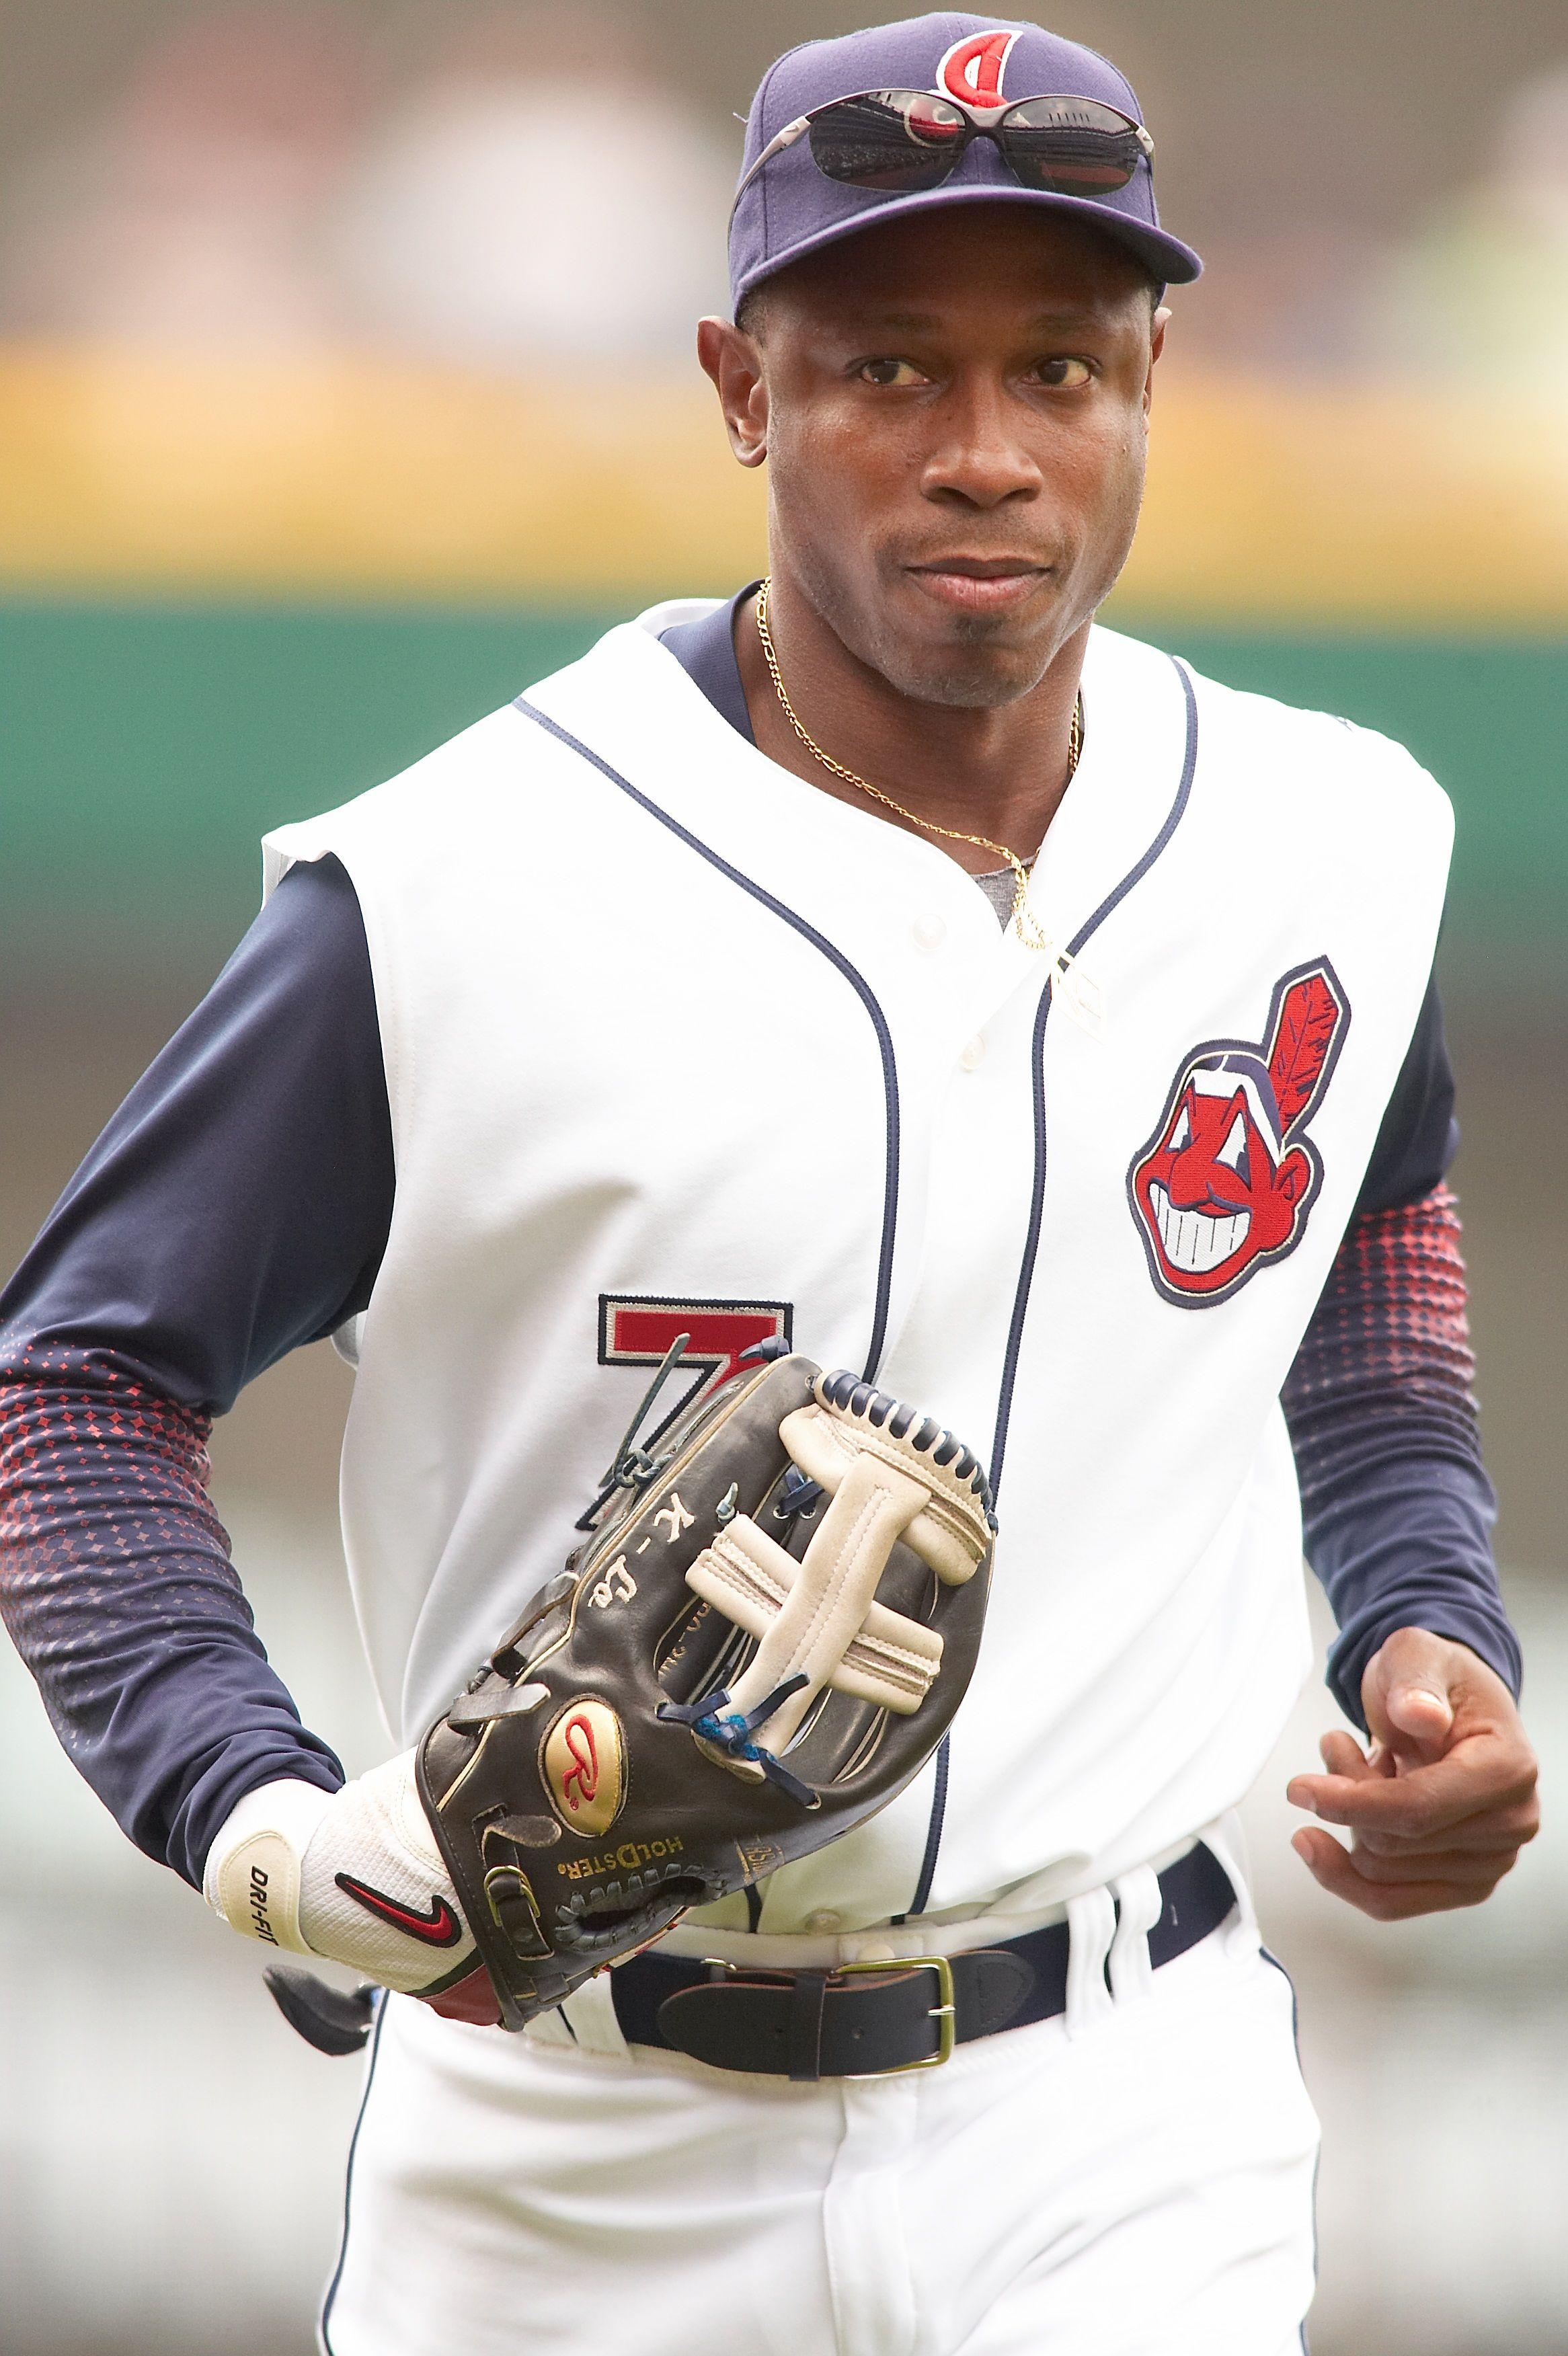 Pin By Aw42 On Baseball Cleveland Indians Baseball Kenny Lofton Cleveland Indians